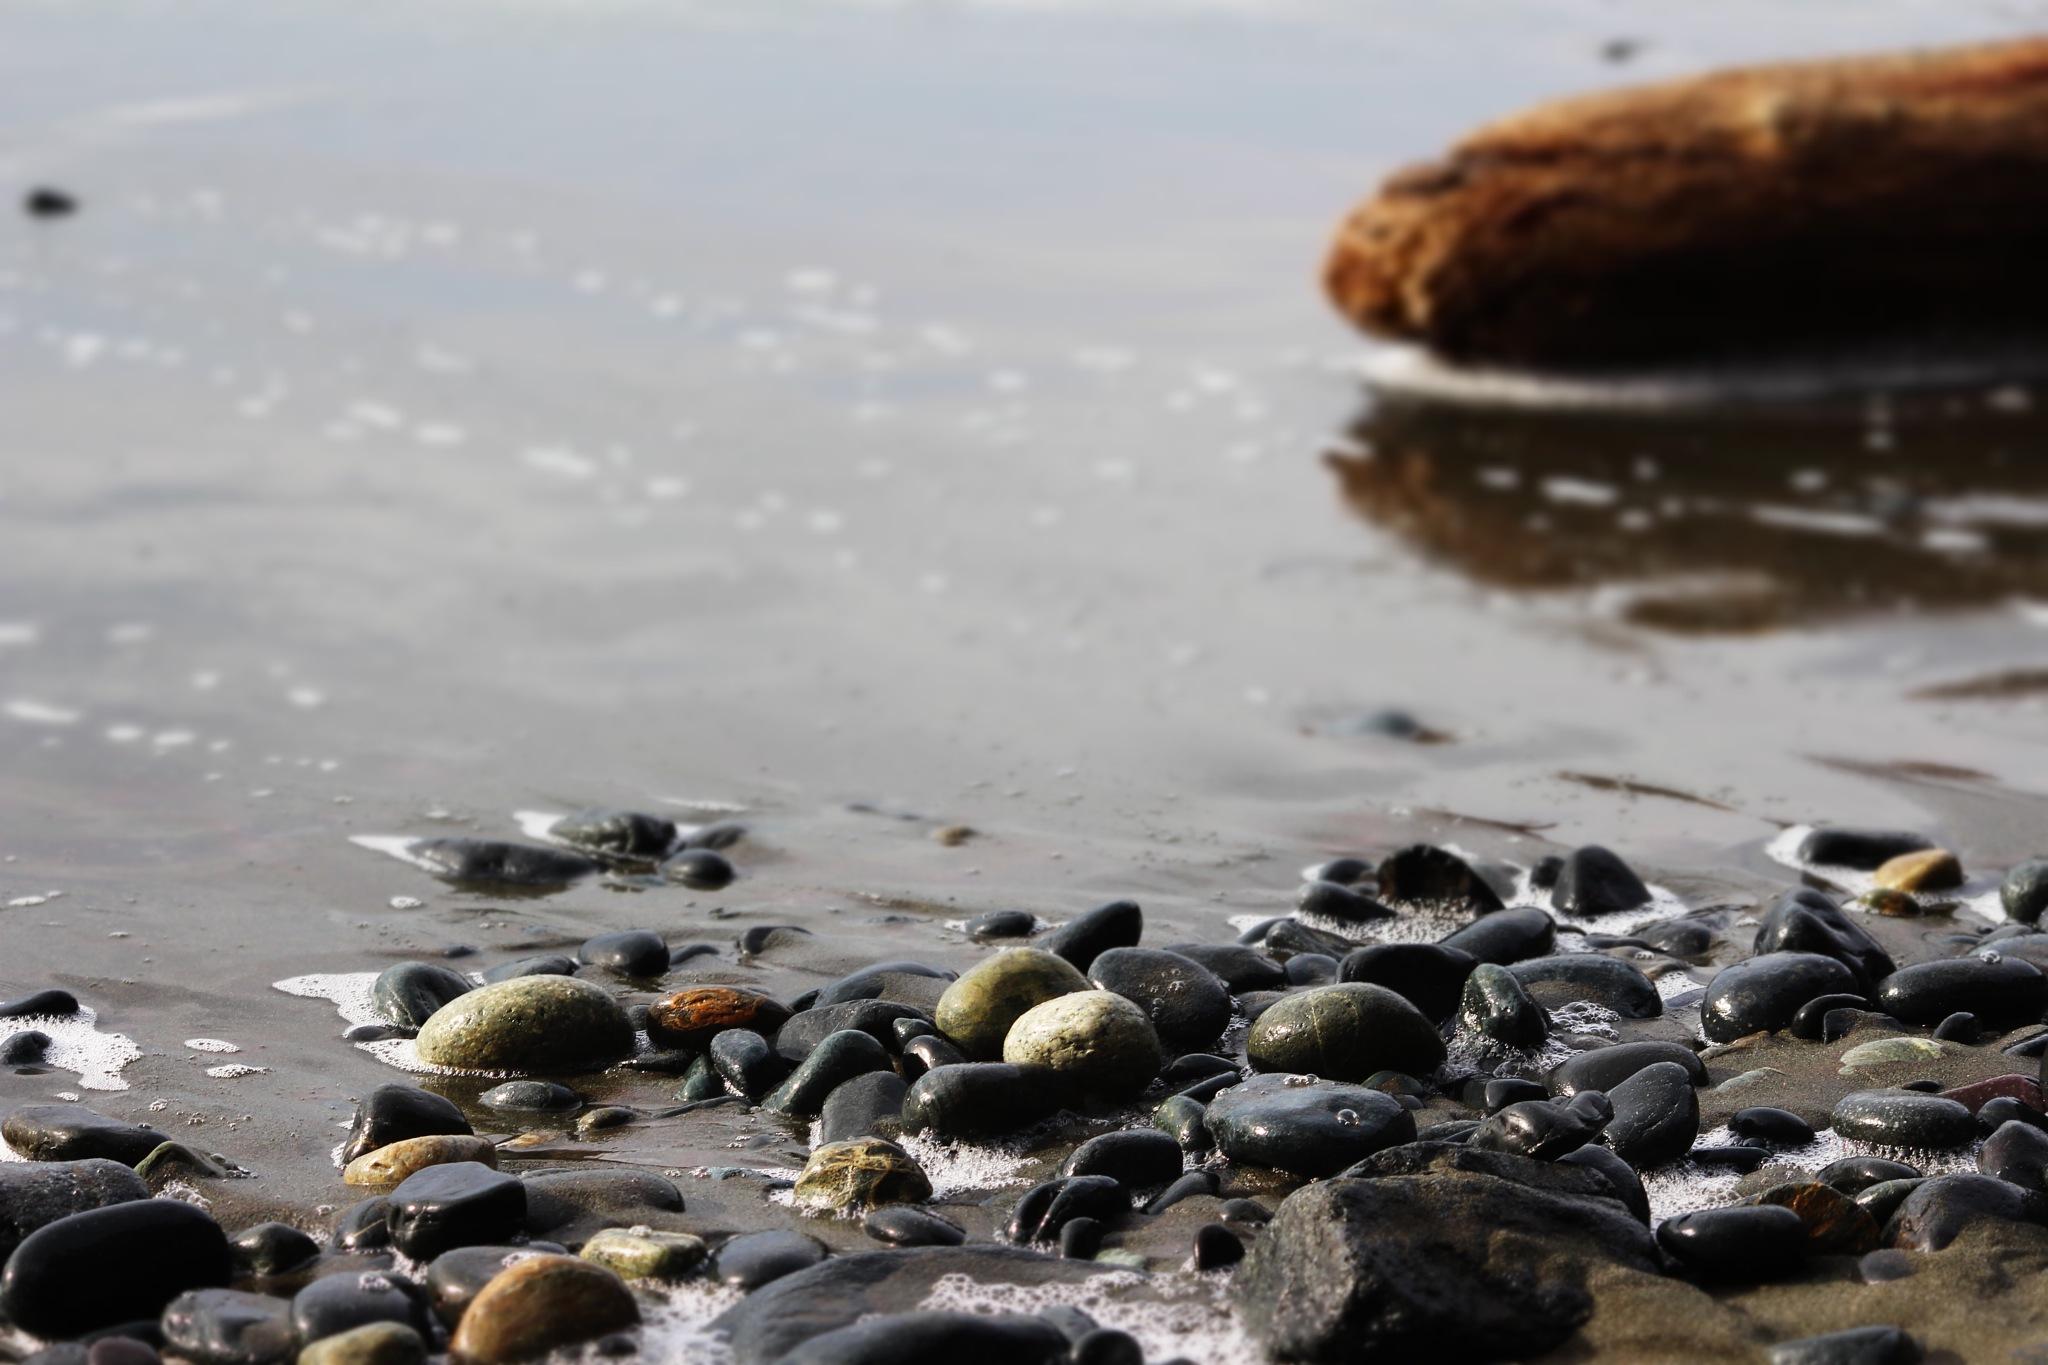 Rocks on the beach by Soblip